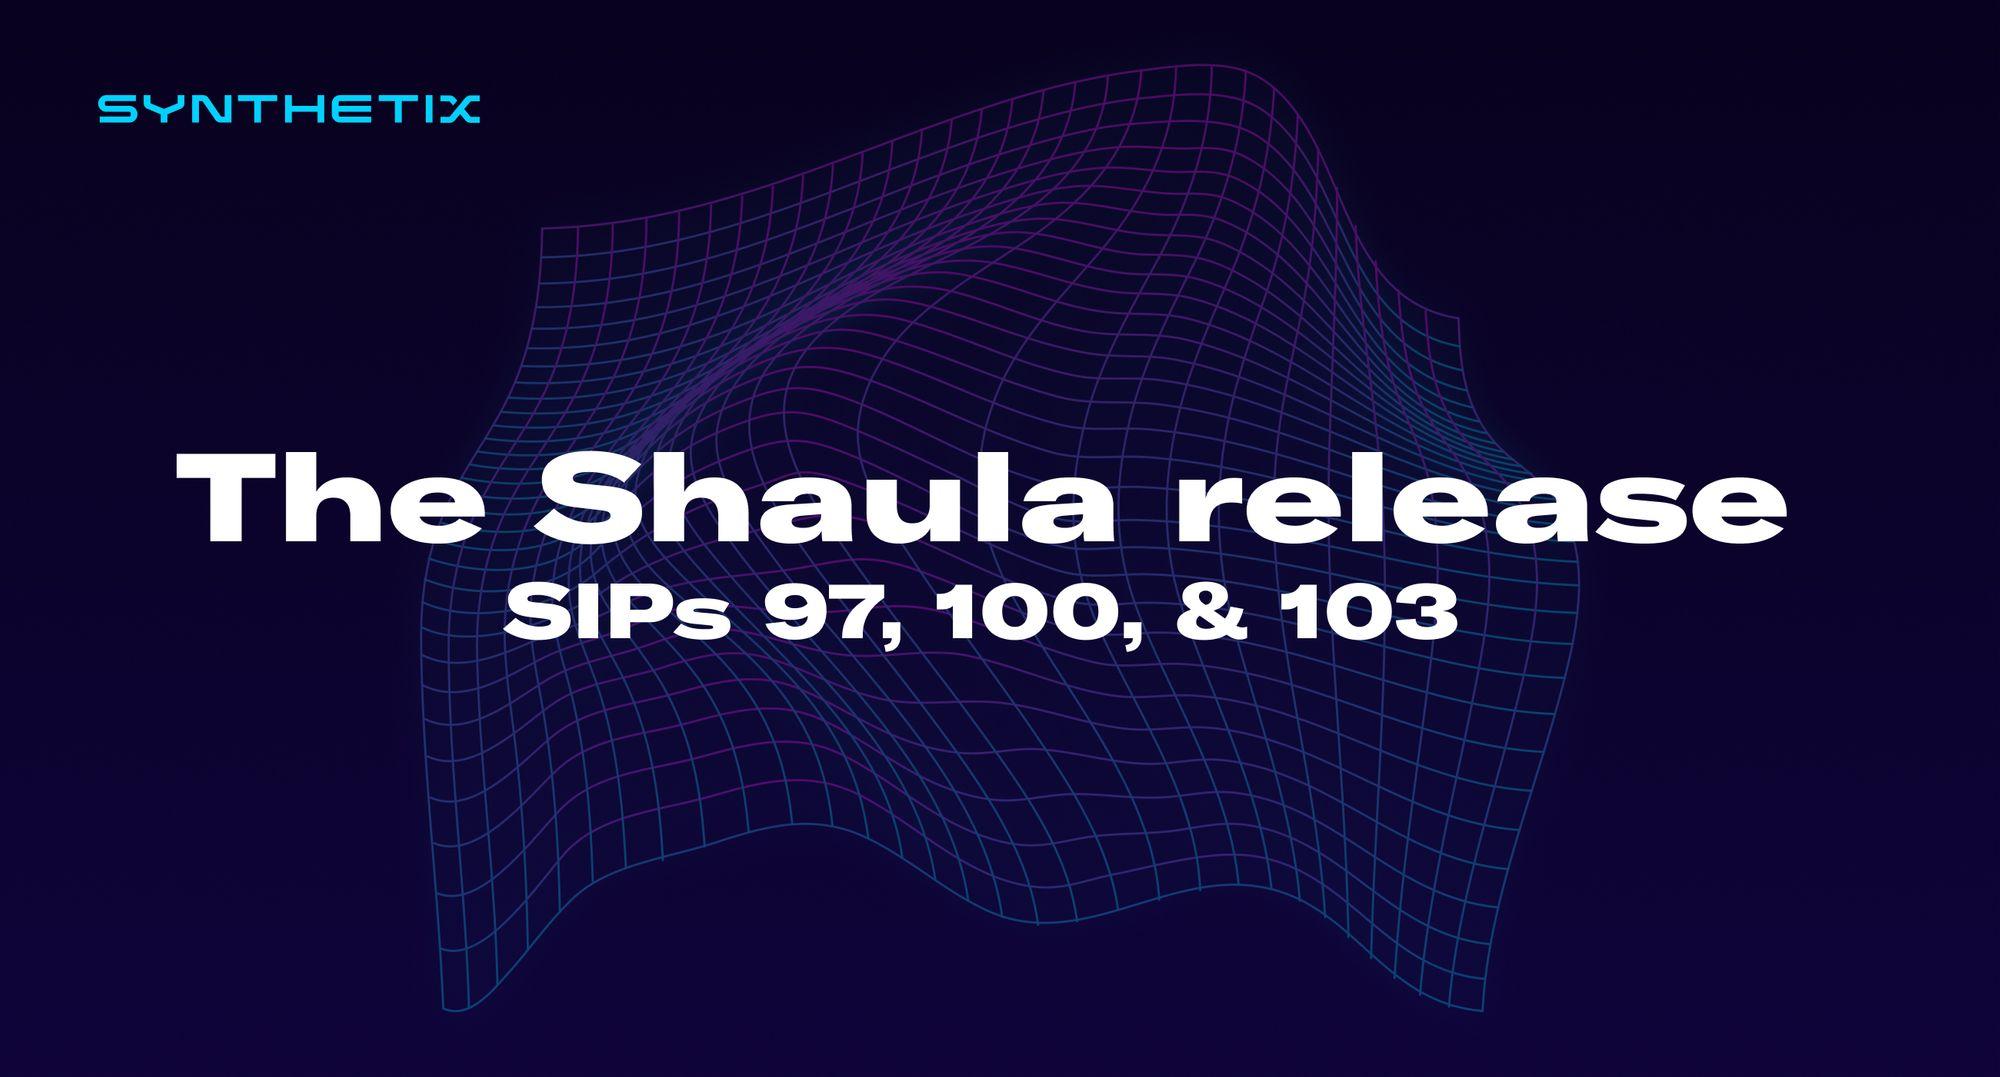 The Shaula release